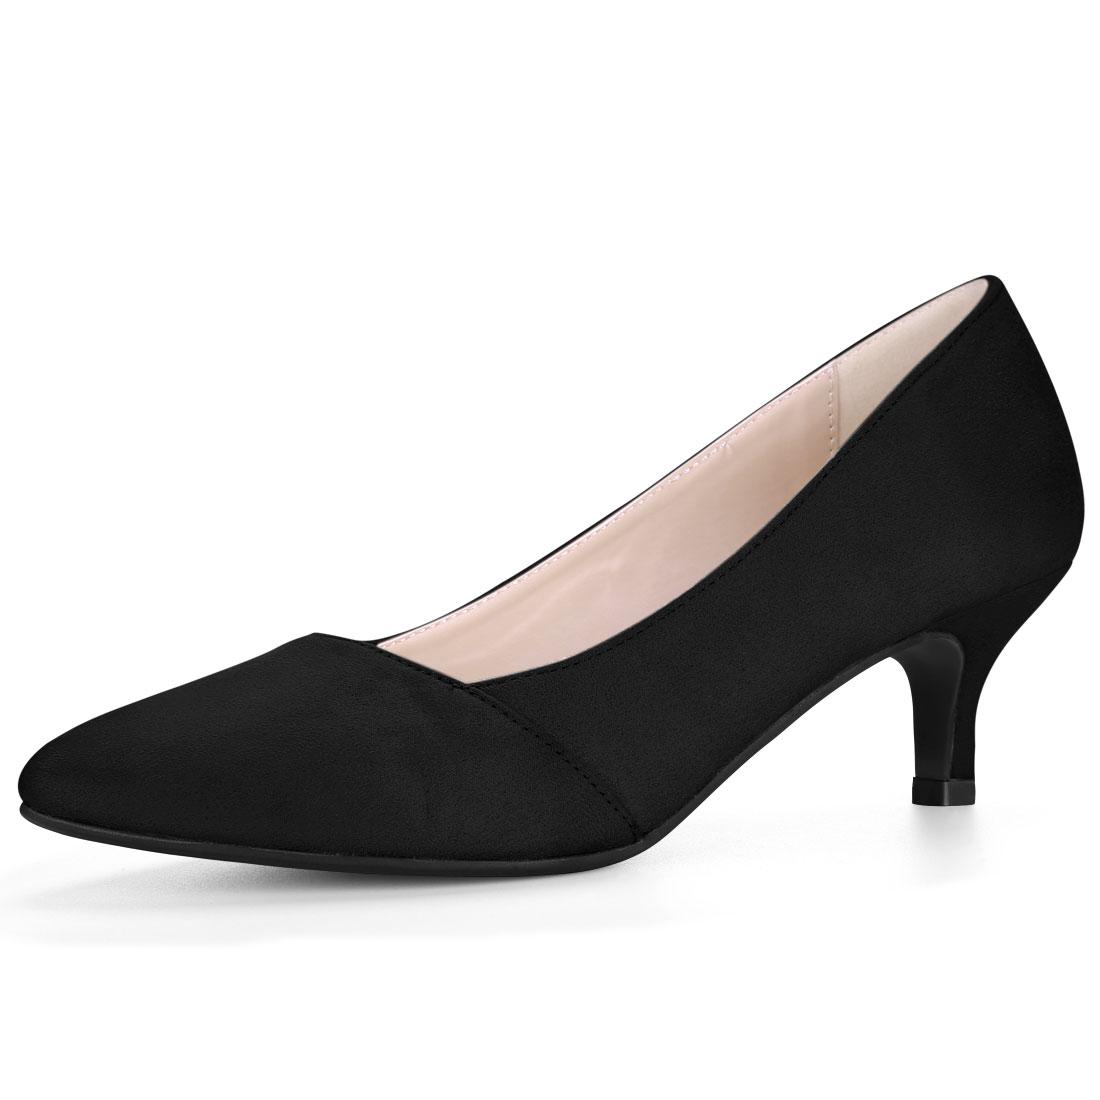 Women Pointed Toe Mid Stiletto Heel Pumps Black US 8